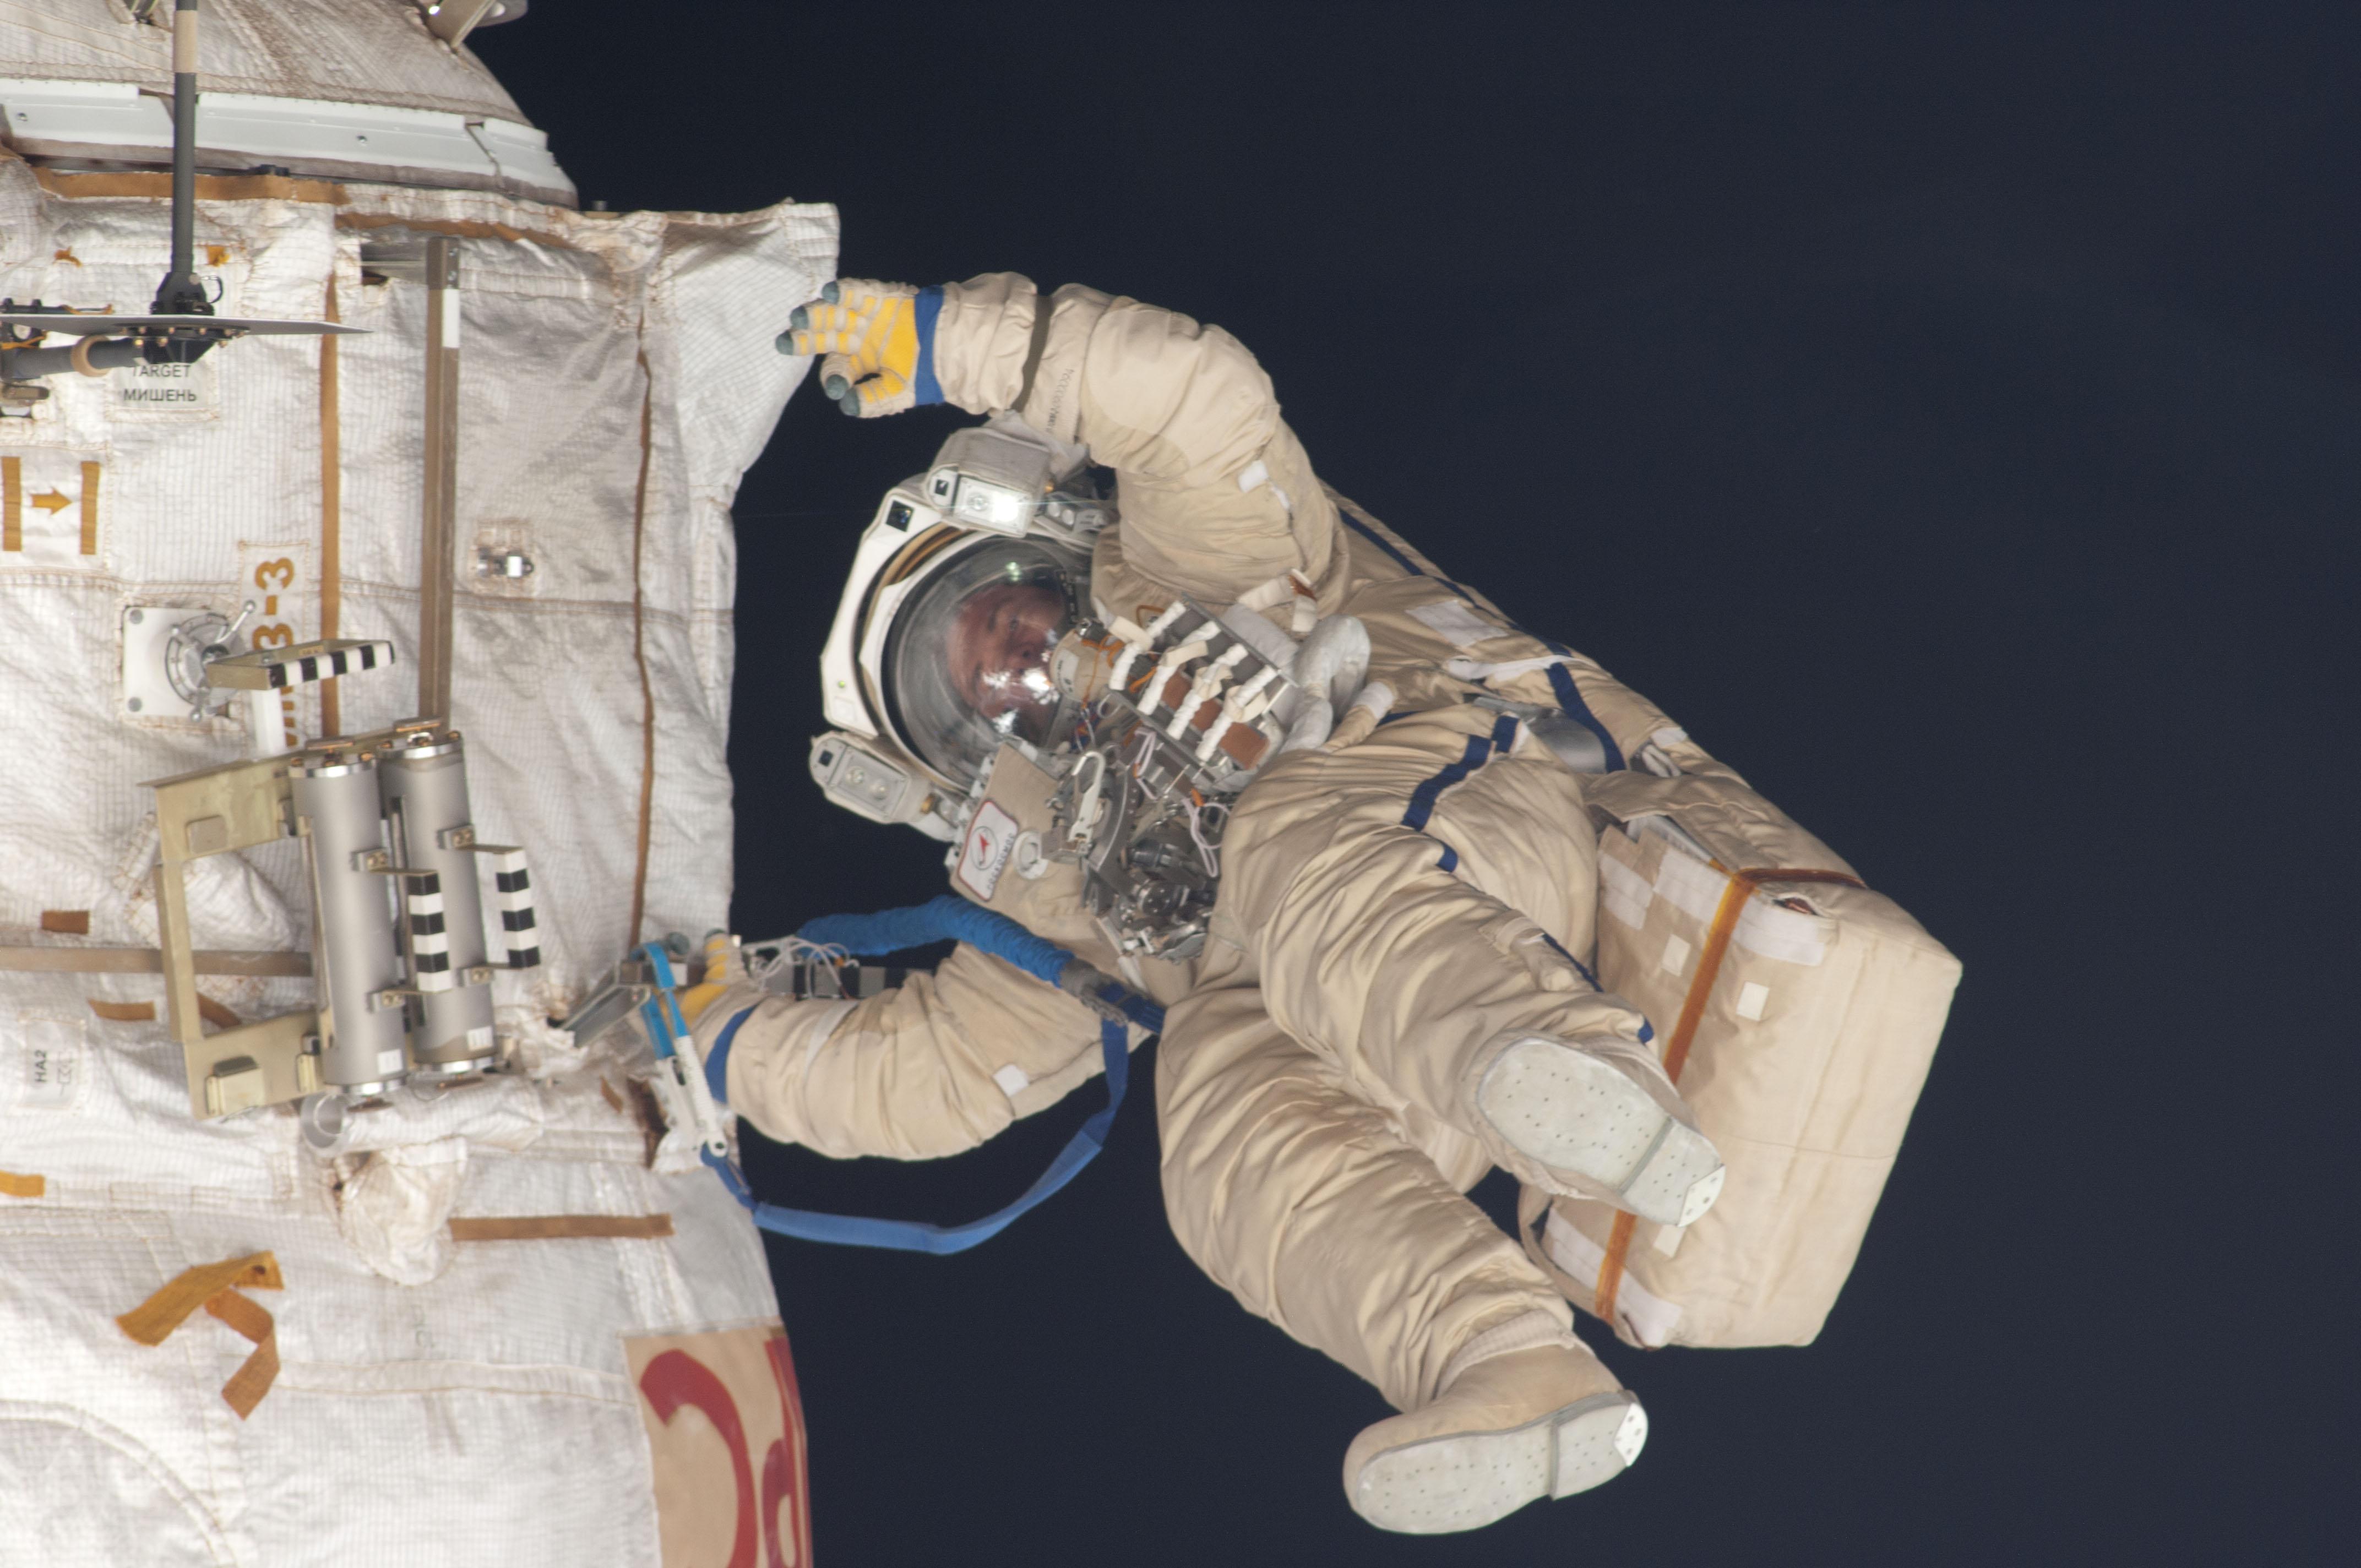 Russian cosmonaut Roman Romanenko on Spacewalk